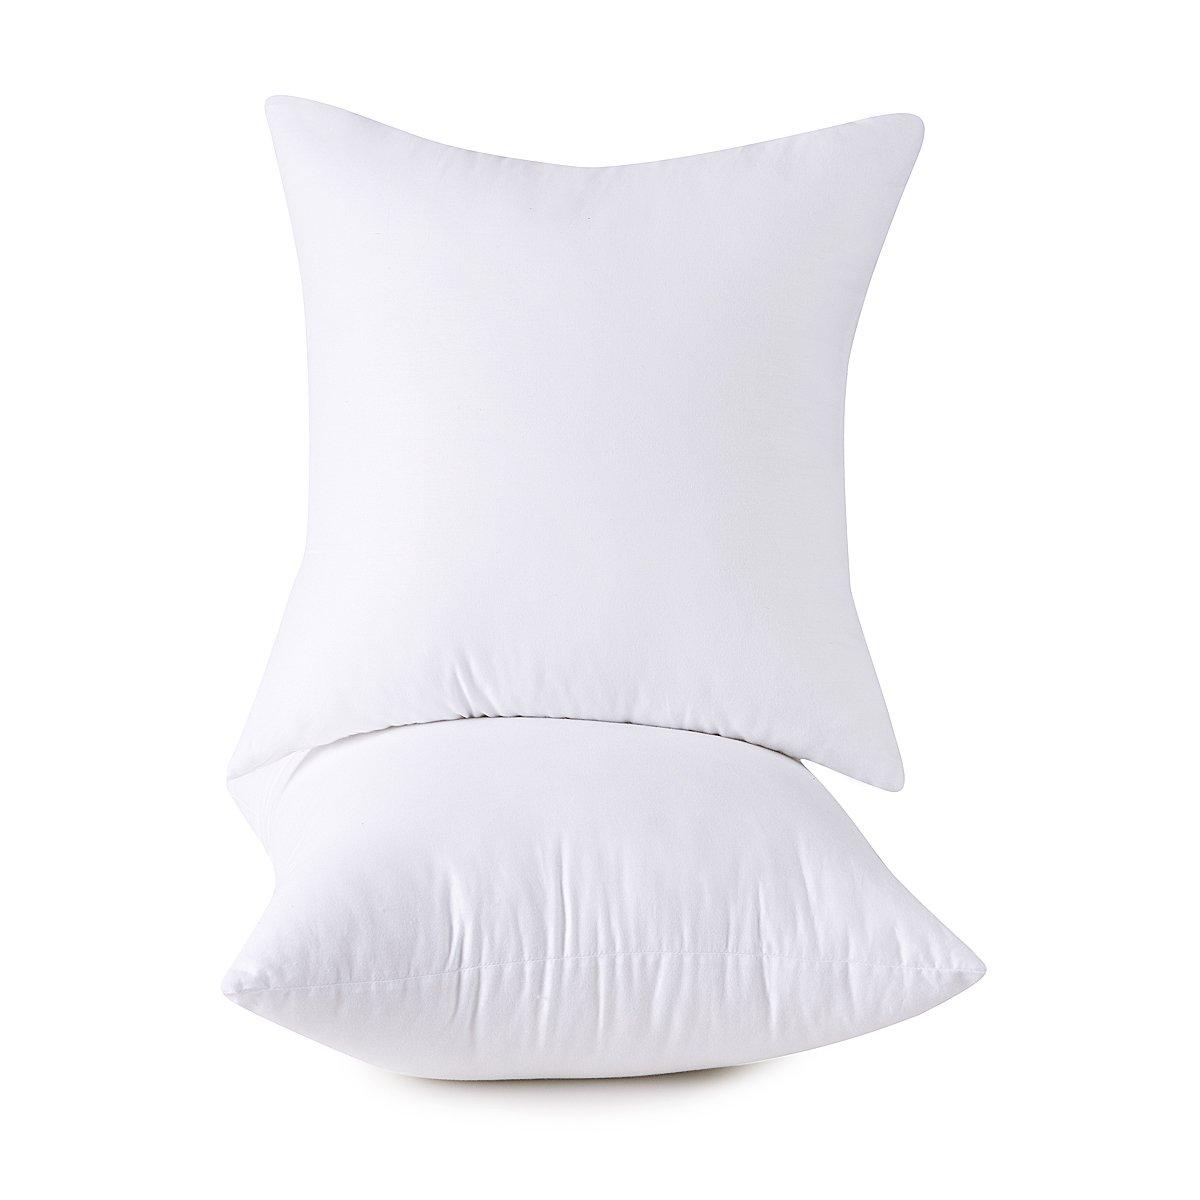 Set of 2, 100% Cotton Down Alternative Decorative Throw Pillow Insert, Square, 26x26 Inch